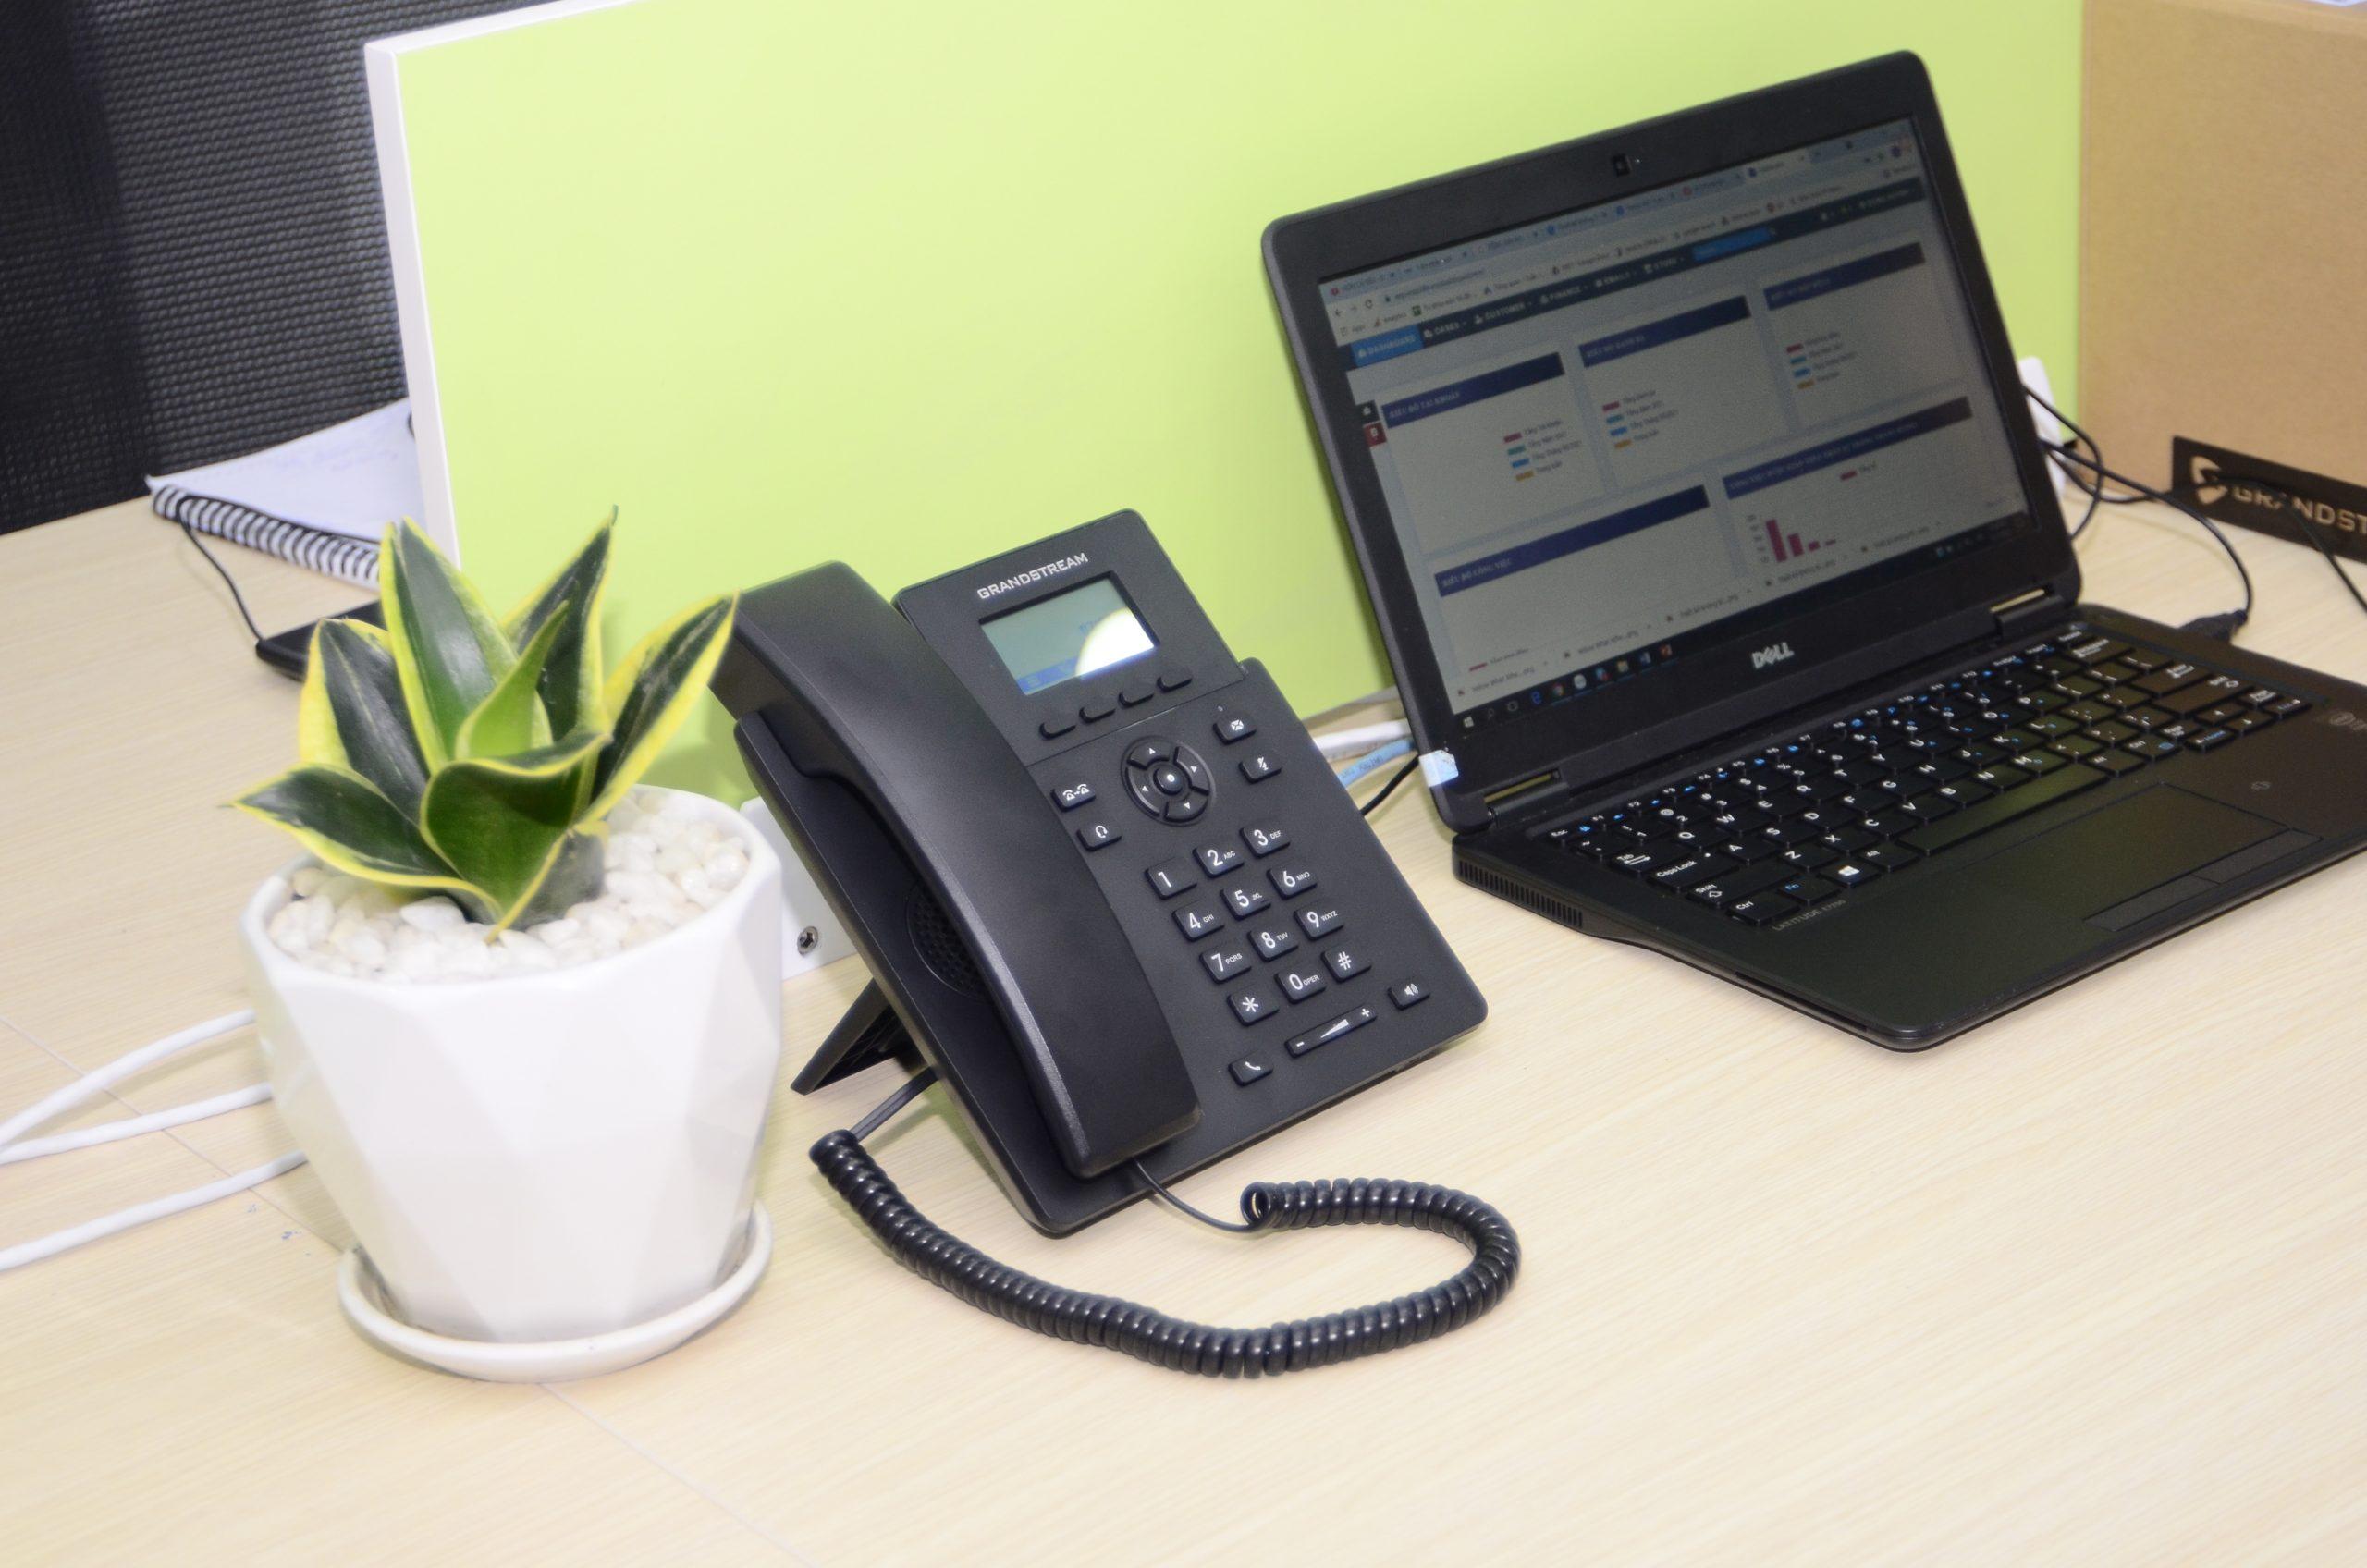 Điện thoại Grandtream GRP 2601